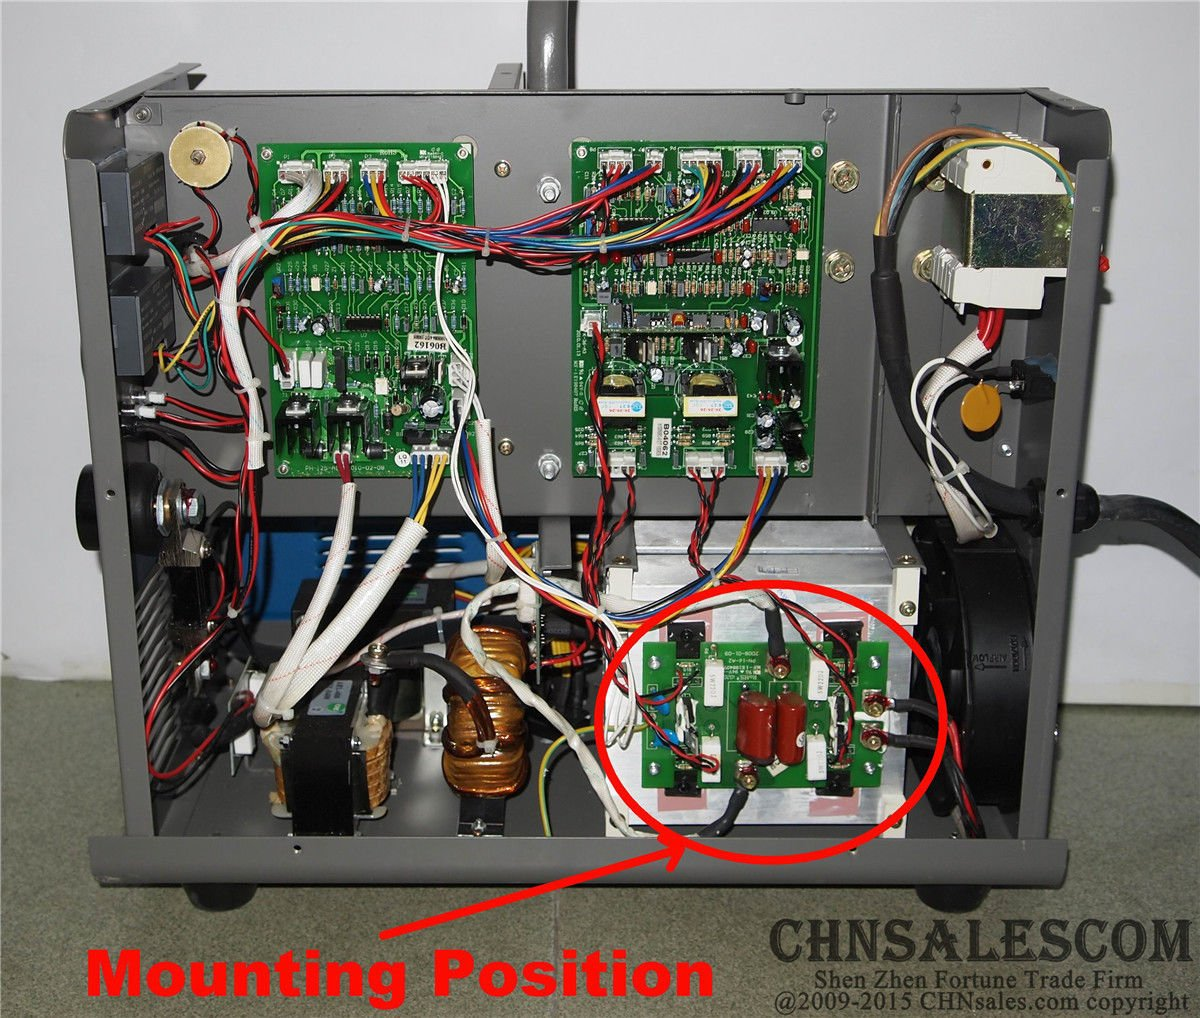 CHNsalescom JASIC IGBT Inverter Board MIG-250 J04 MIG-270 N248 MIG/MAG Welder 10001929: Amazon.es: Bricolaje y herramientas